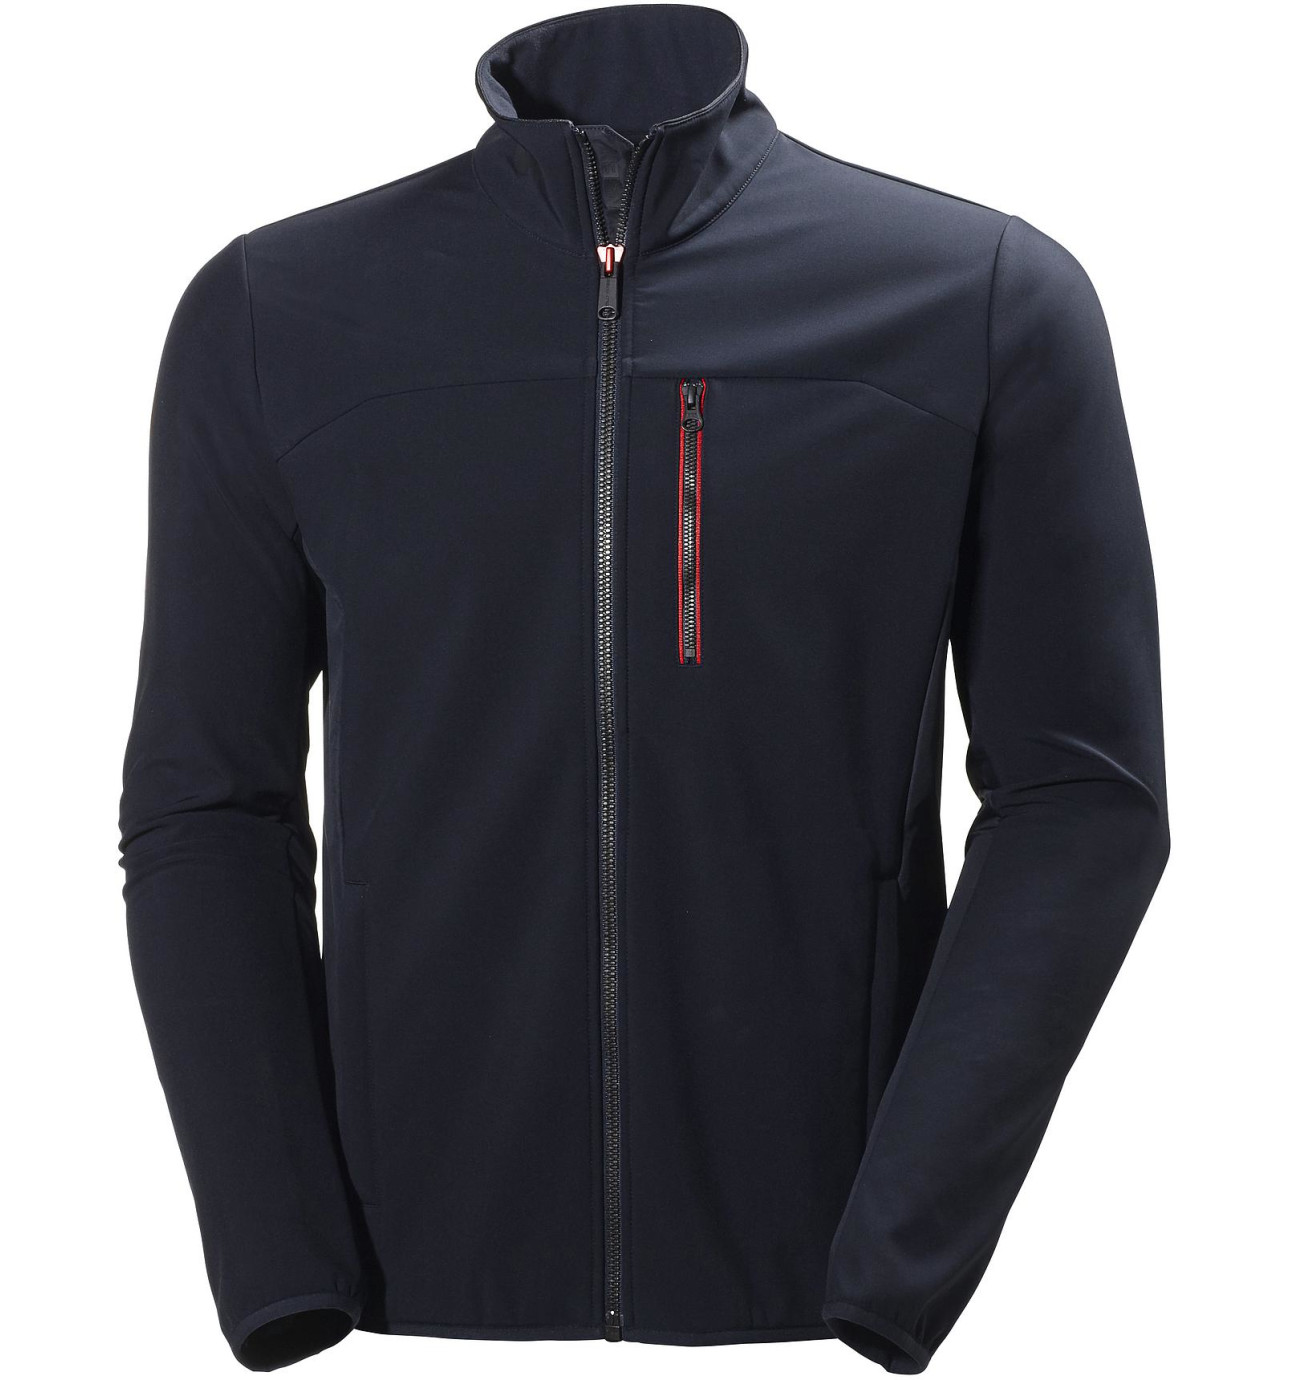 Mens jacket david jones - Crew Softshell Jacket